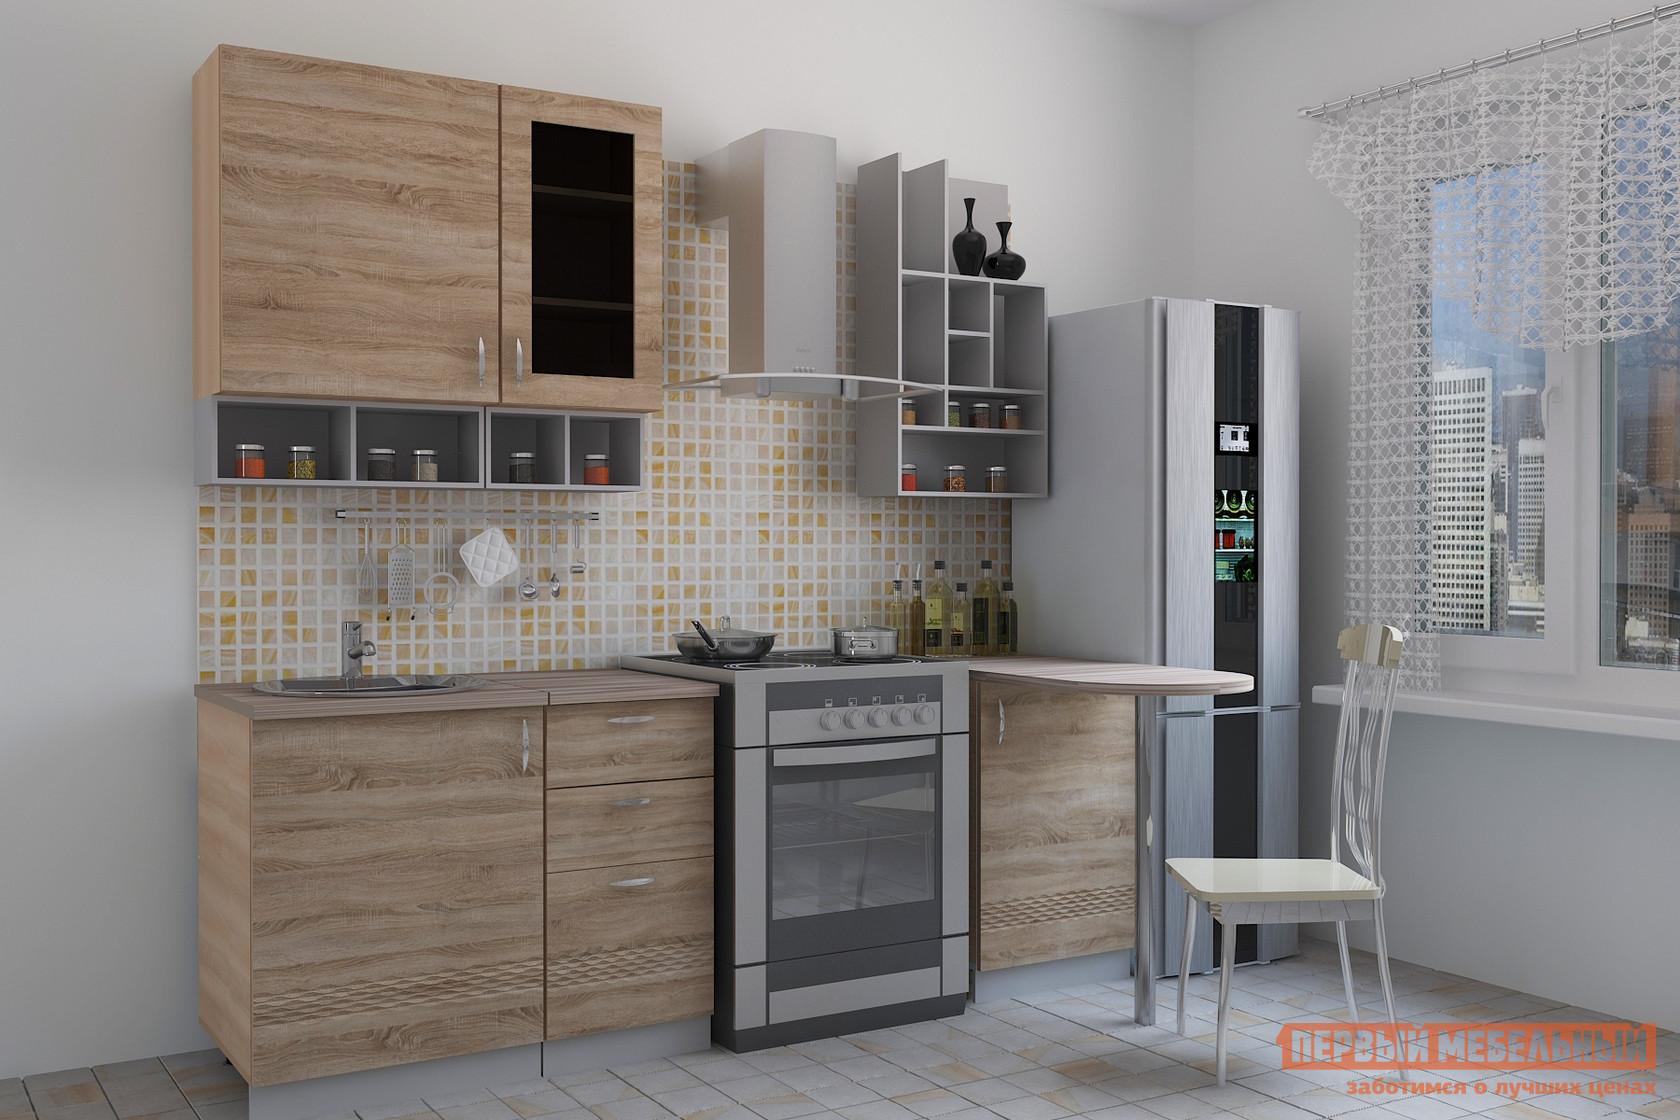 Кухонный гарнитур МО РОСТ Тоскана 5 (quinto) кухонный гарнитур трия фэнтези 120 см